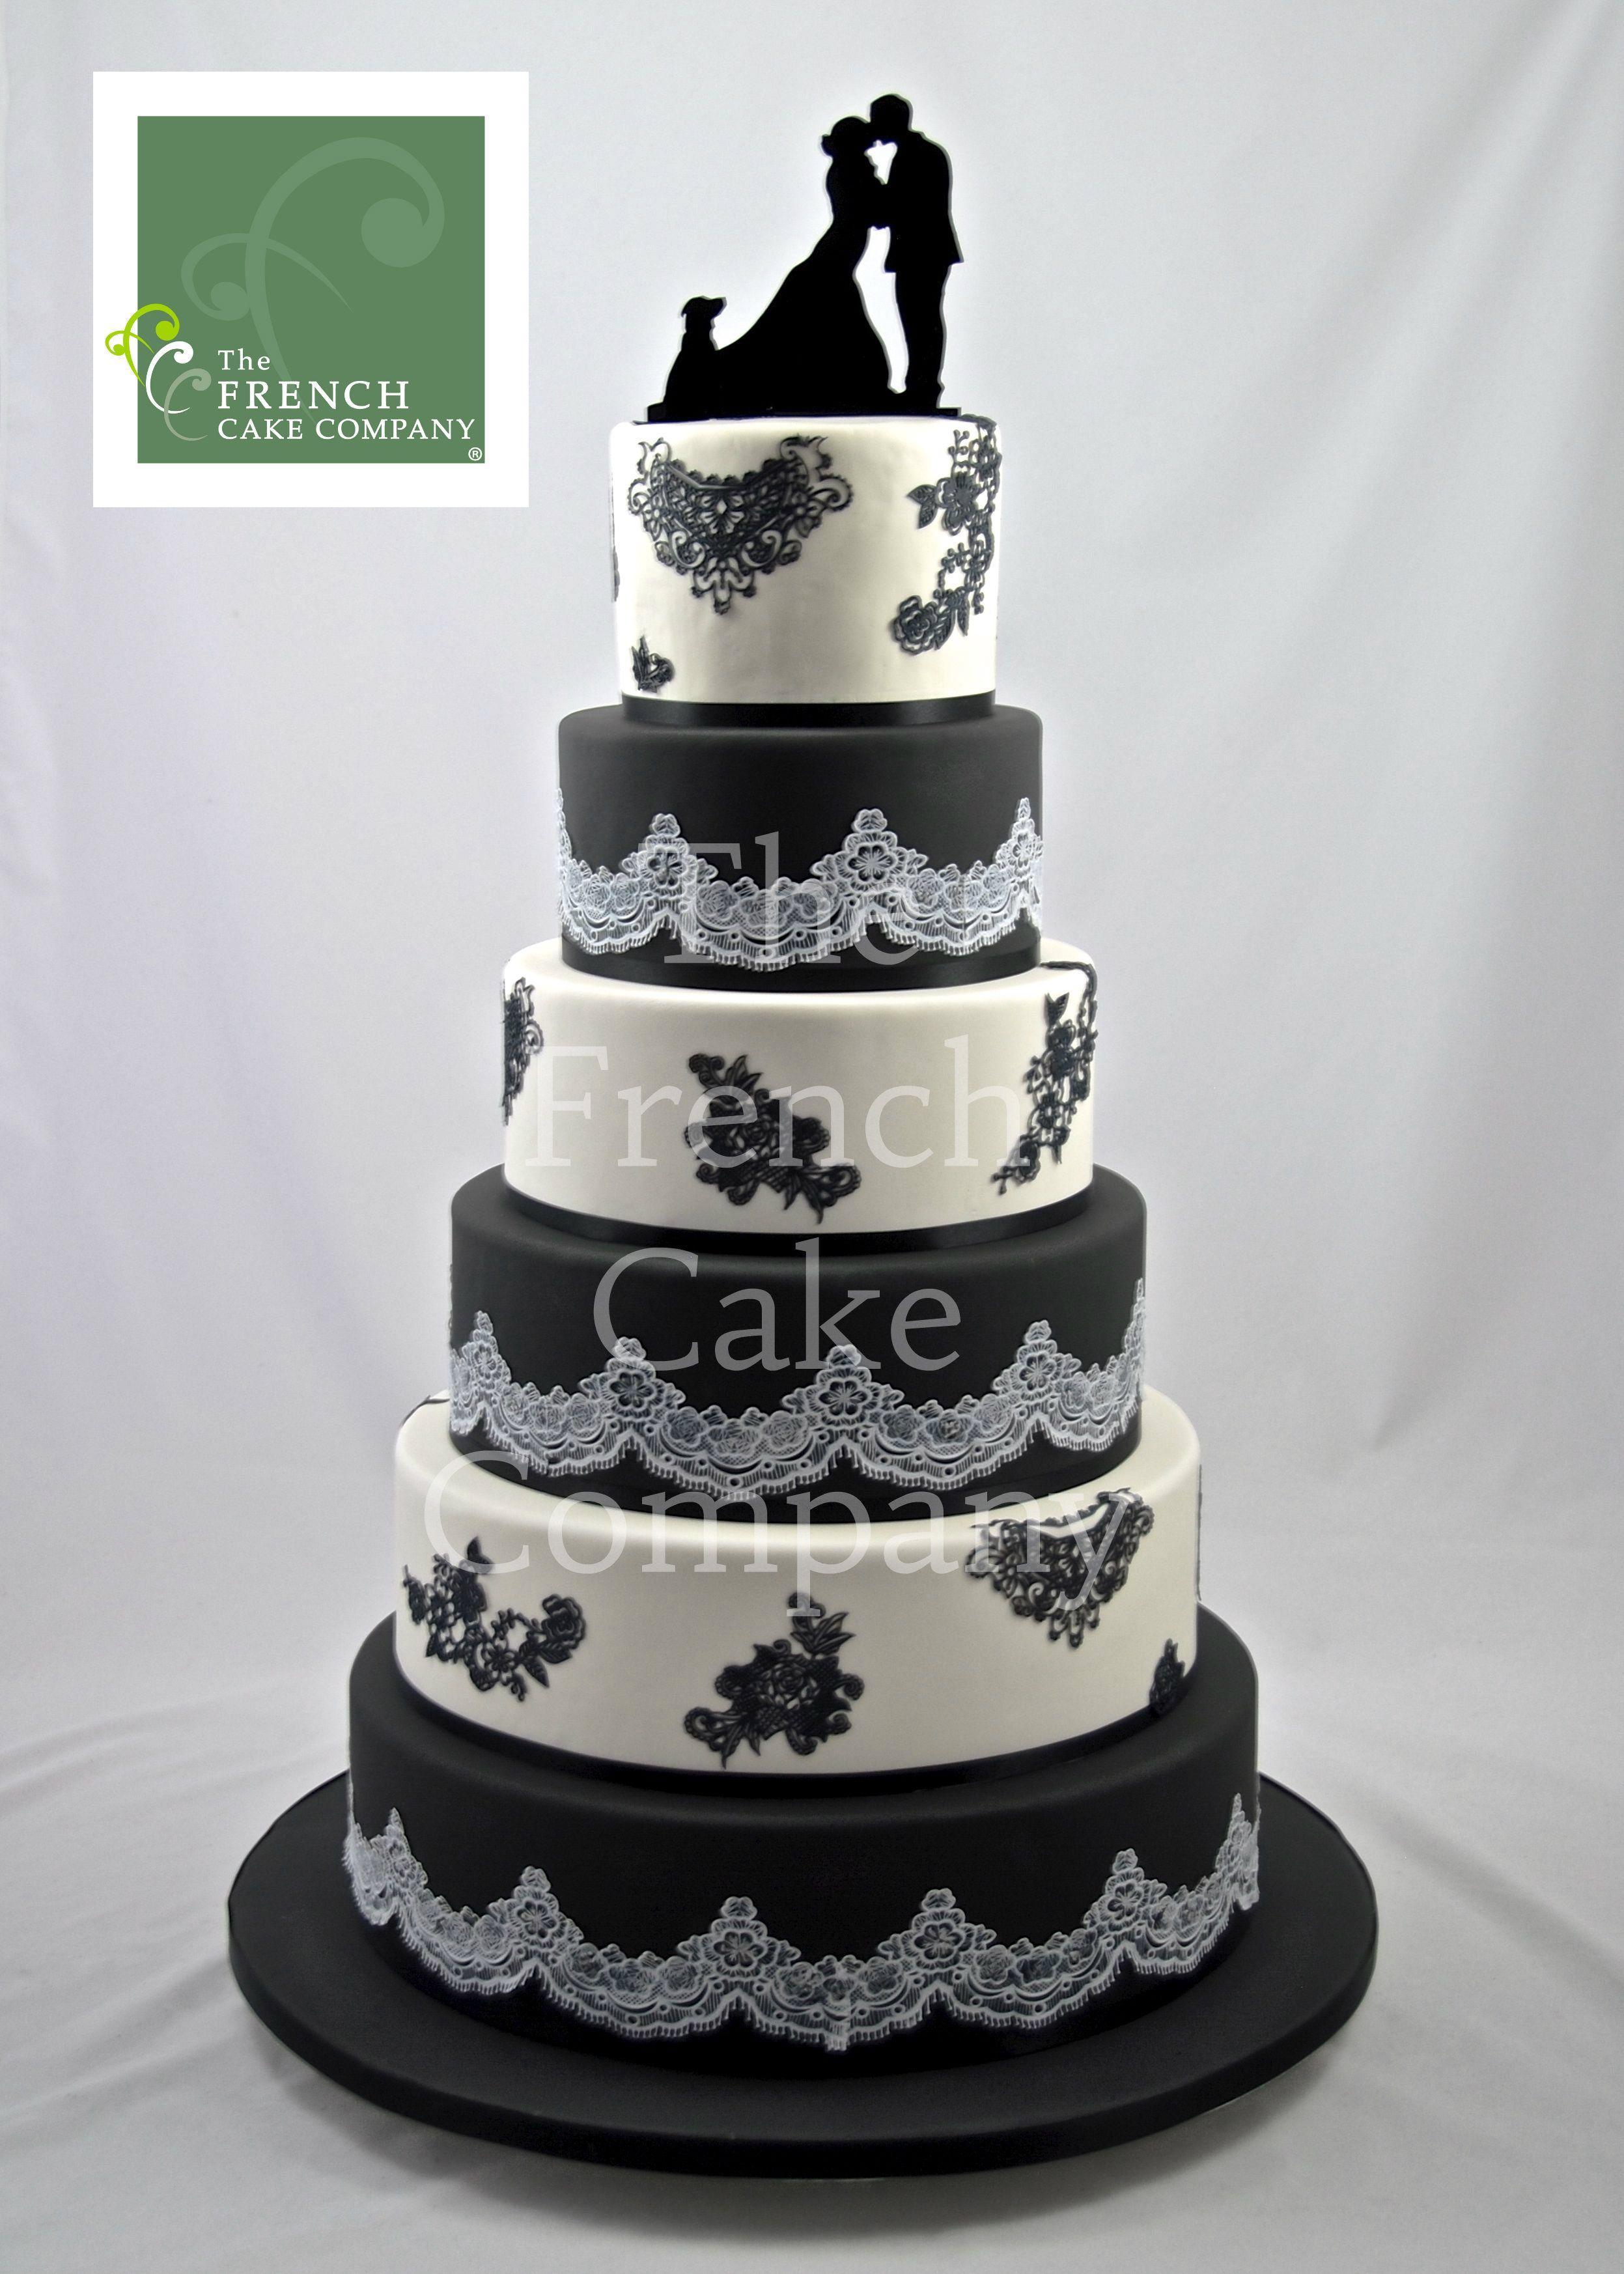 wedding cake black and white piece montee mariage noir. Black Bedroom Furniture Sets. Home Design Ideas